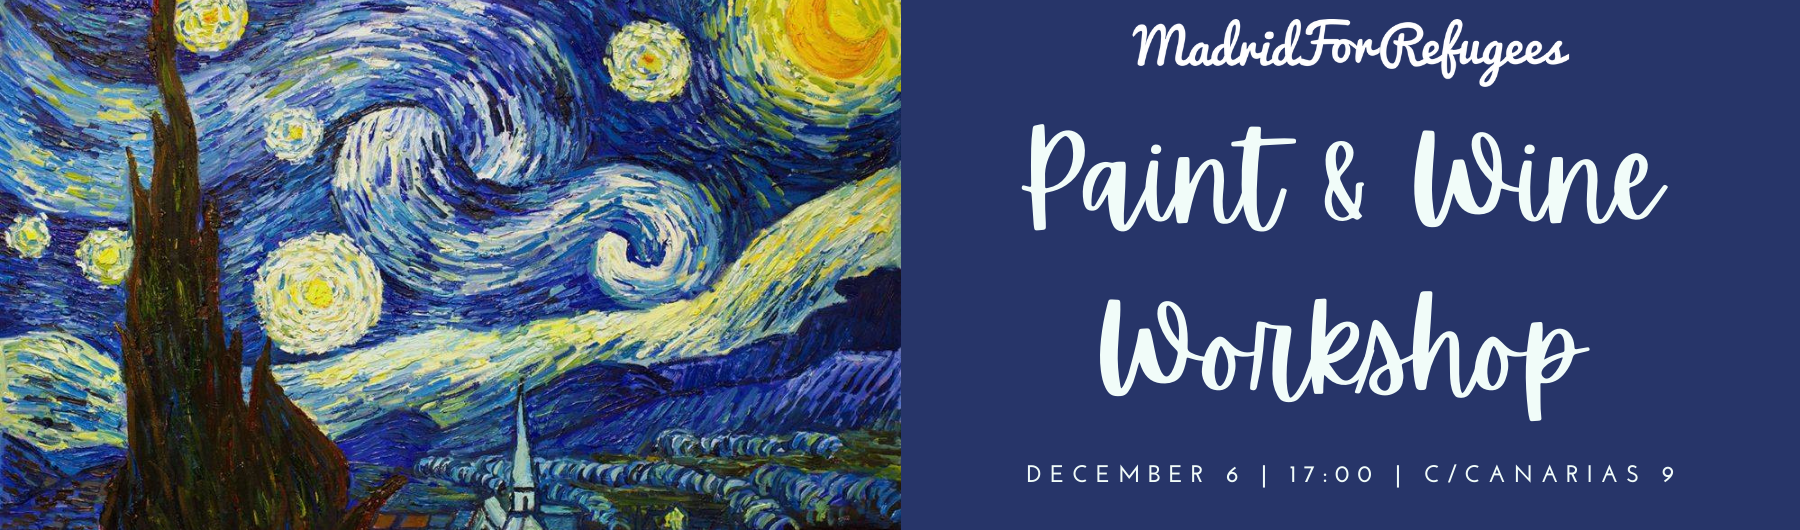 Paint & Wine Workshop: Starry Night